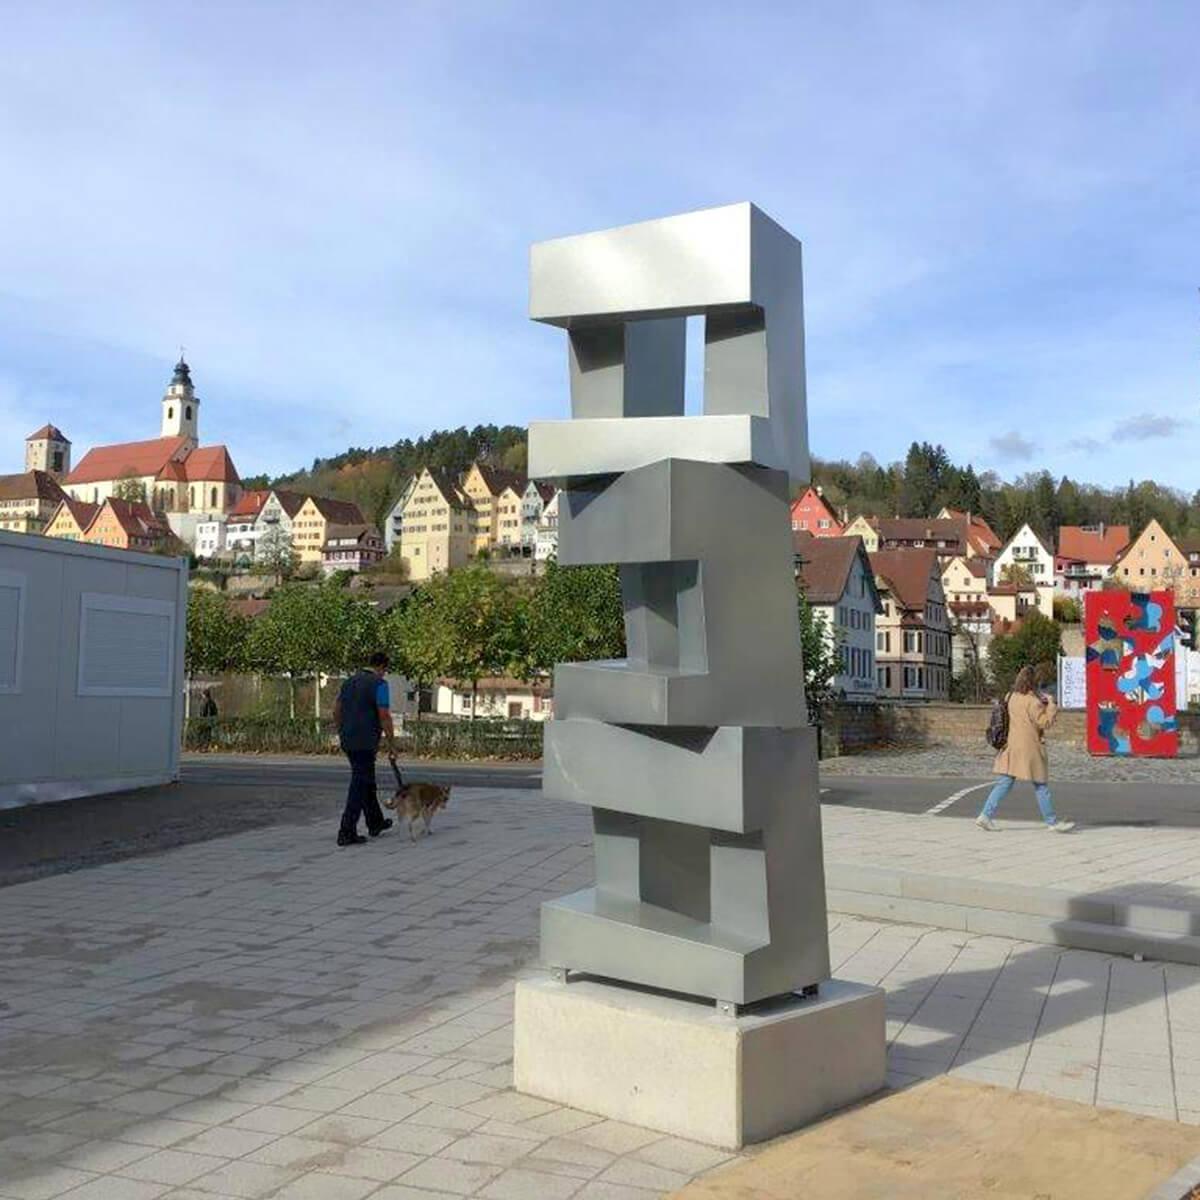 Bildhauer OMI Riesterer Karlsruhe Projekte Skulptur Dreiviertel Horb am Neckar